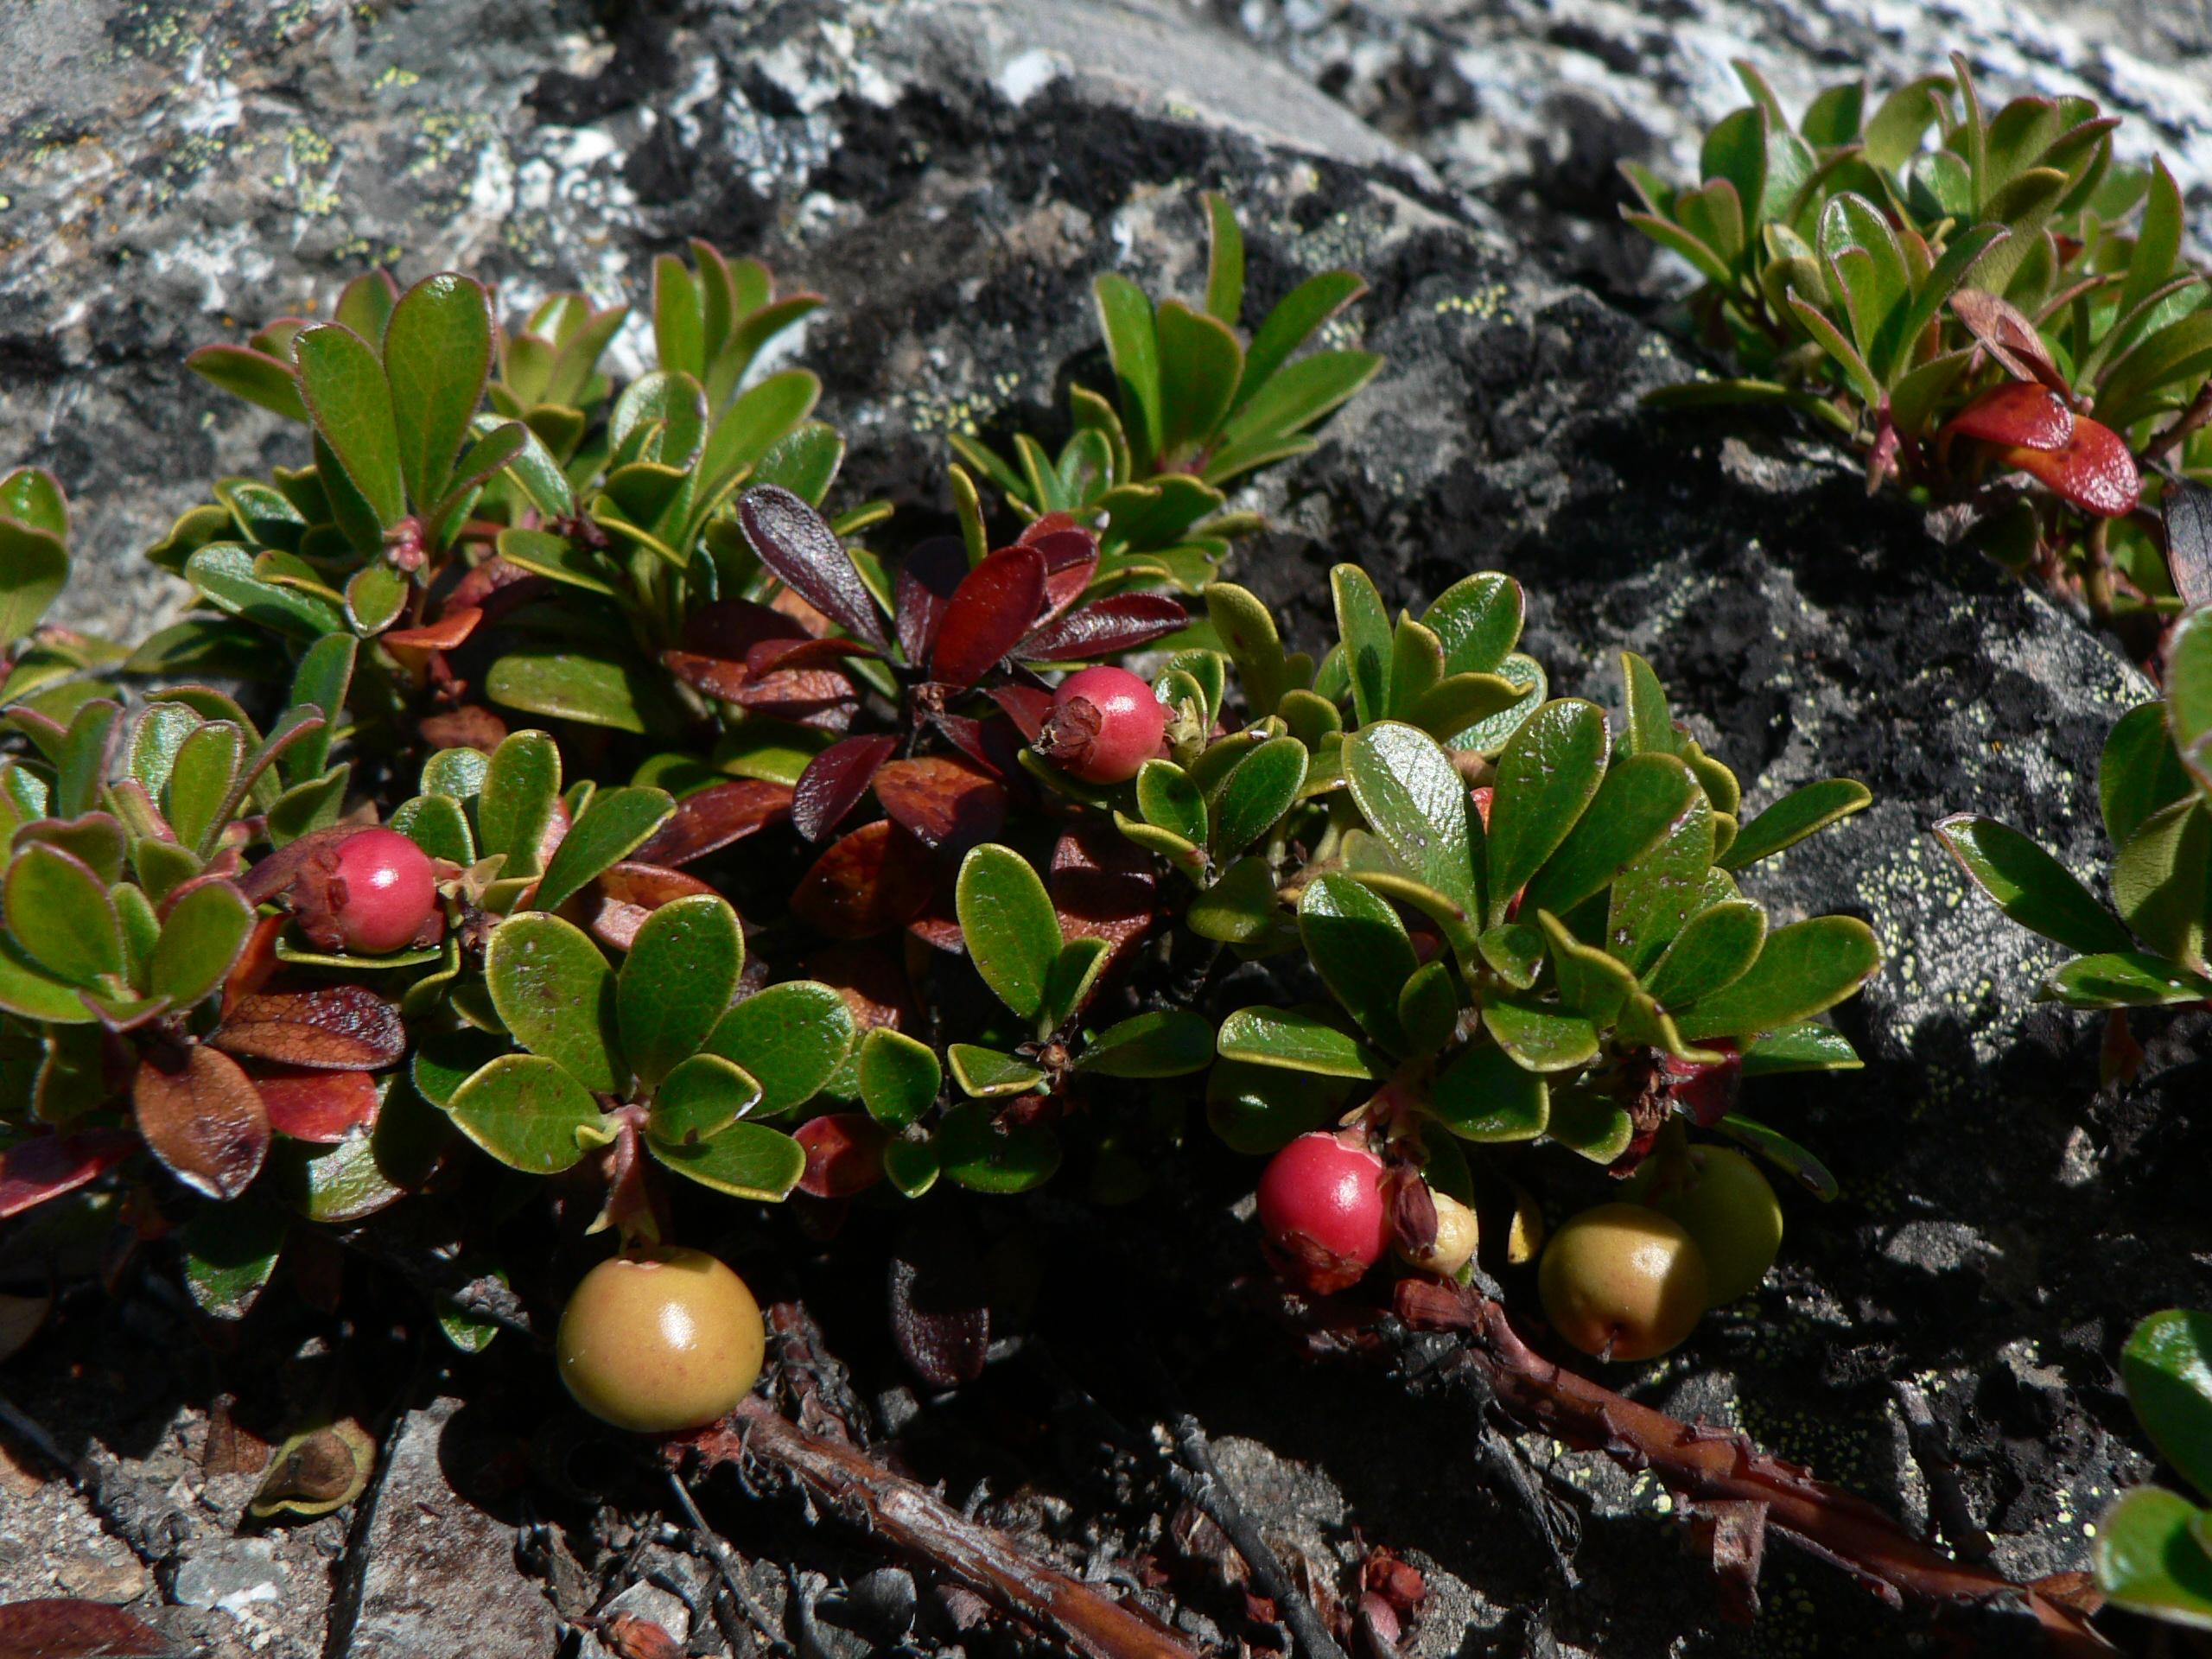 File:Arctostaphylos uva-ursi 23018.JPG - Wikimedia Commons